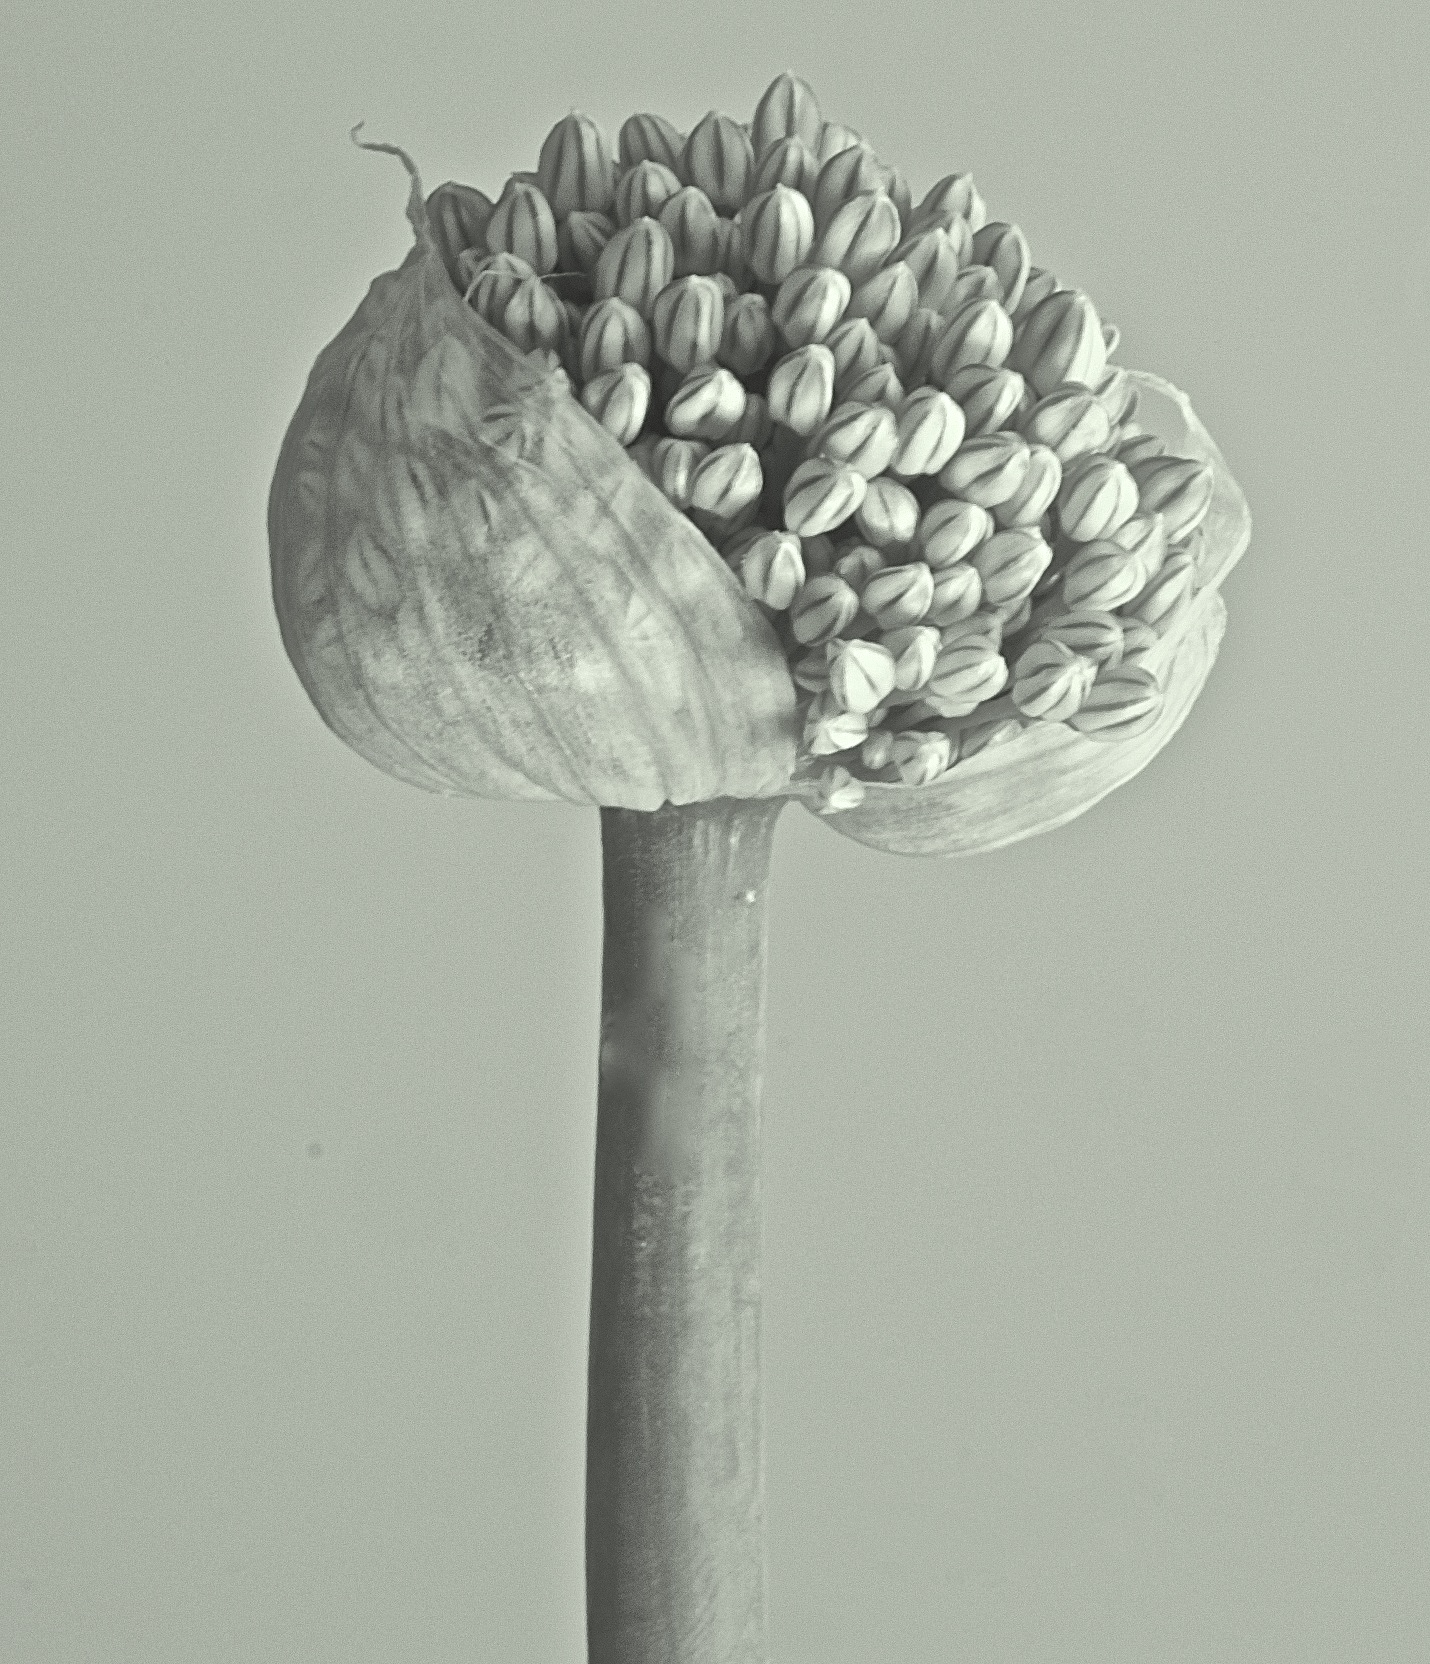 Onion flowering, 2016